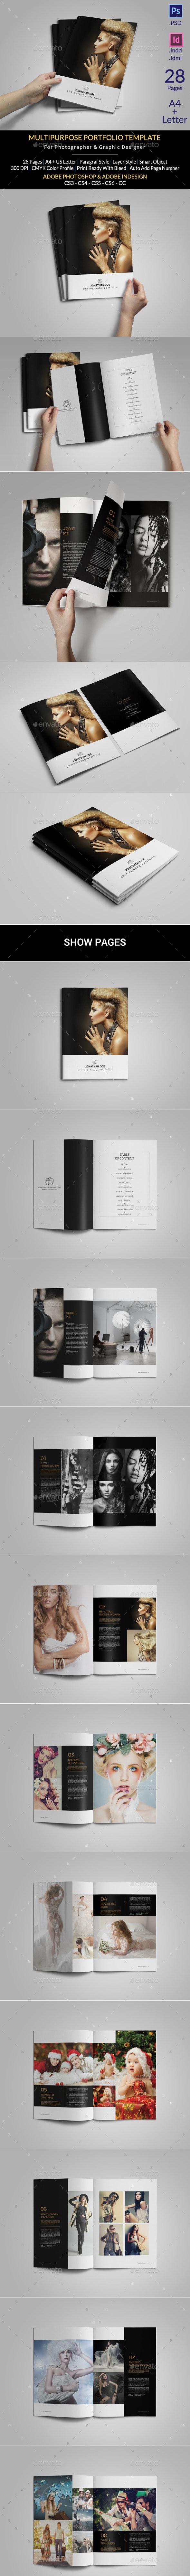 Portfolio Photographer - Portfolio Brochures